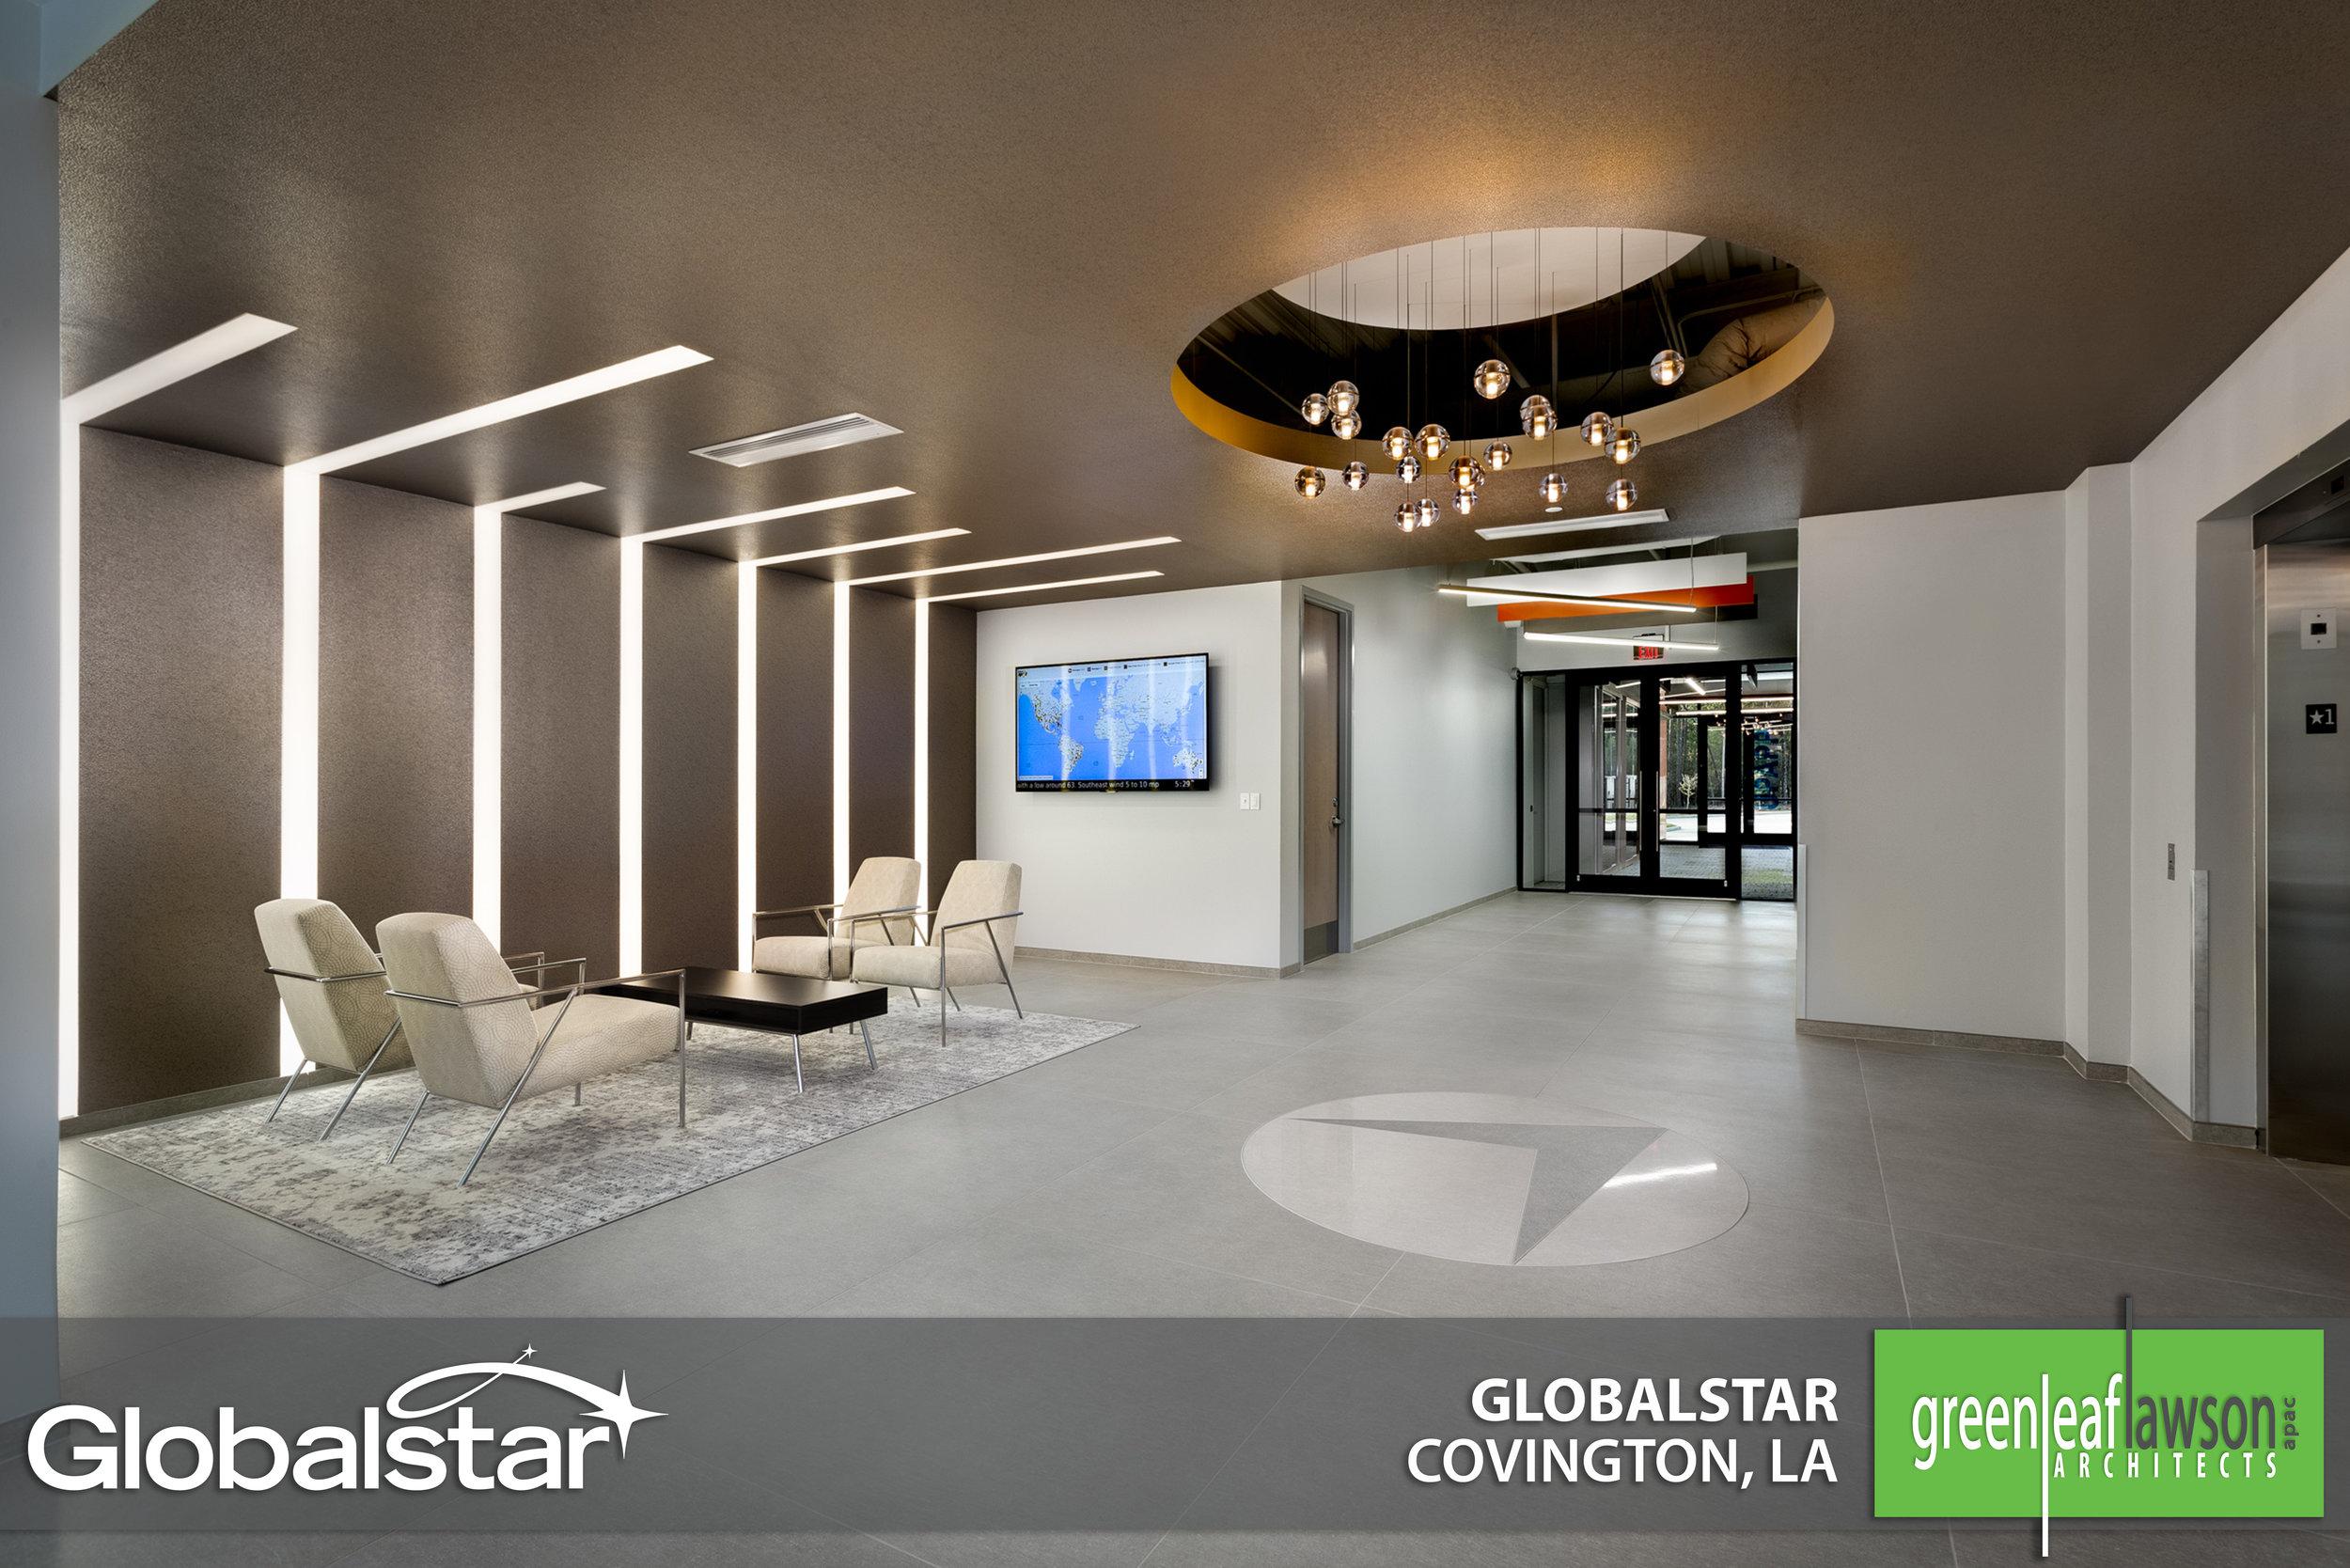 Globalstar 3.jpg